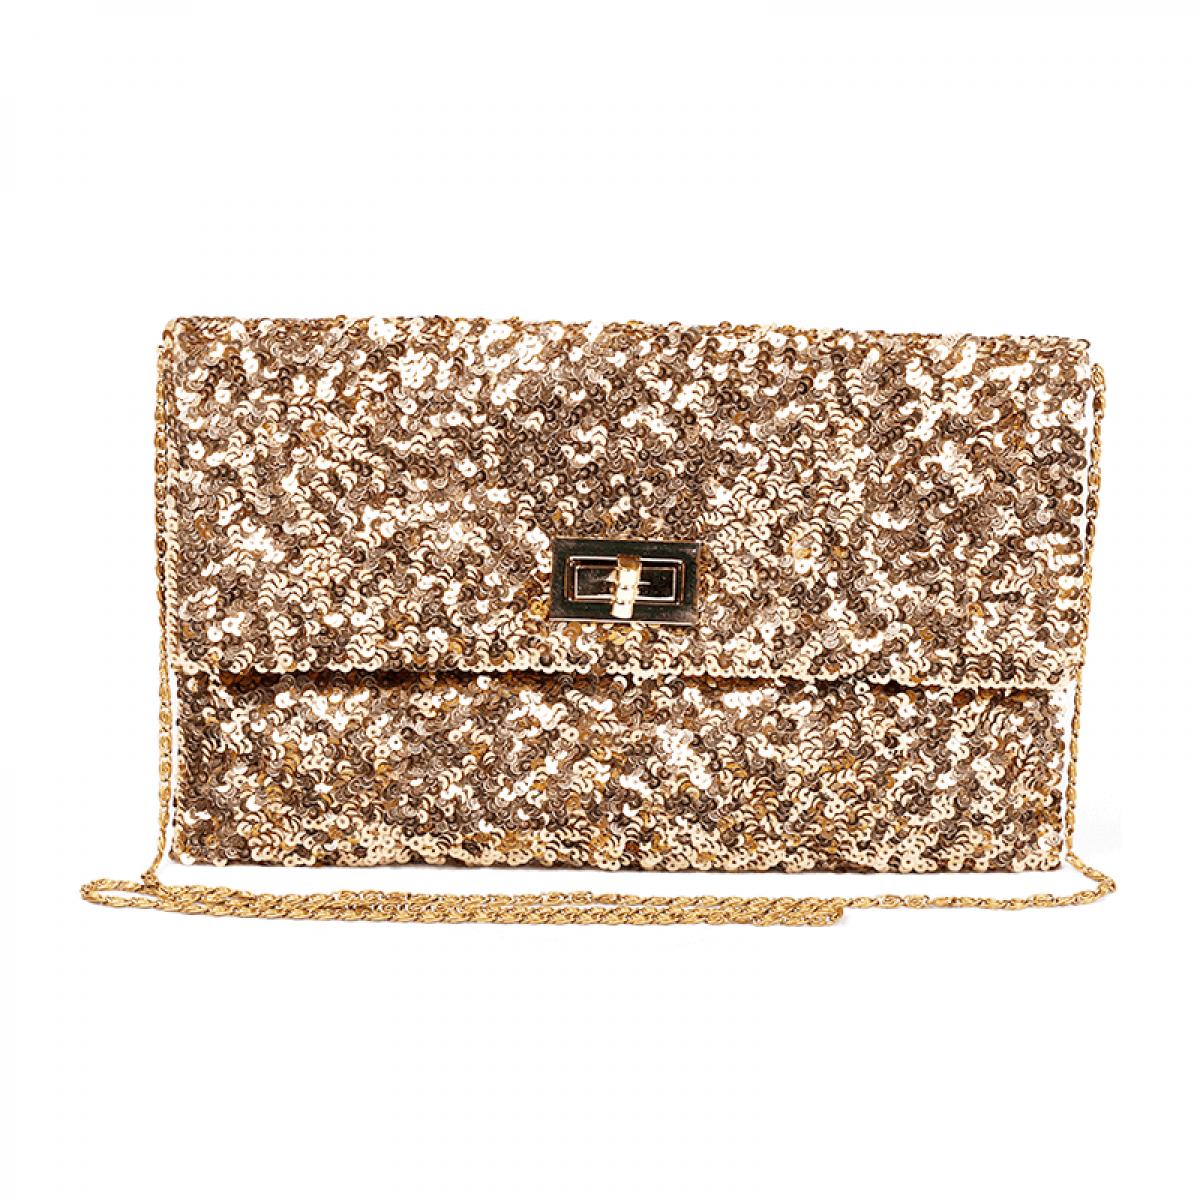 Gold sequin cross body evening clutch bag